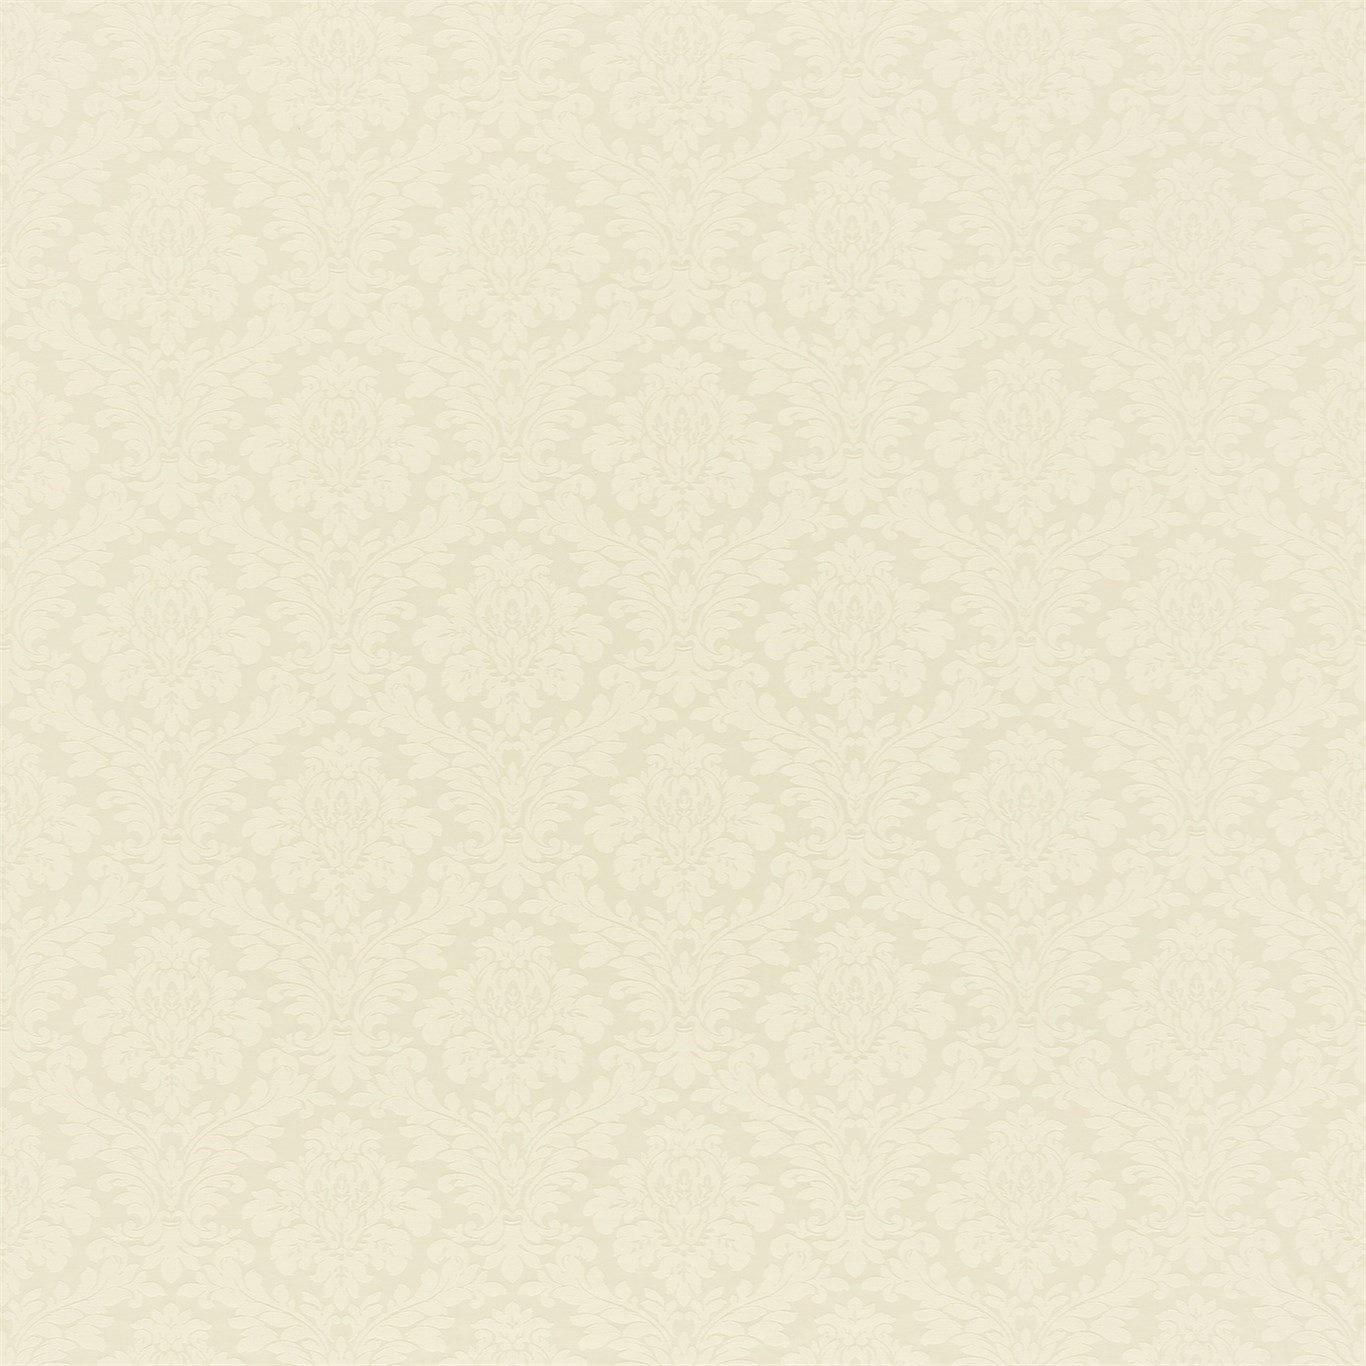 Image of Sanderson Lymington Damask Cream Fabric 232594